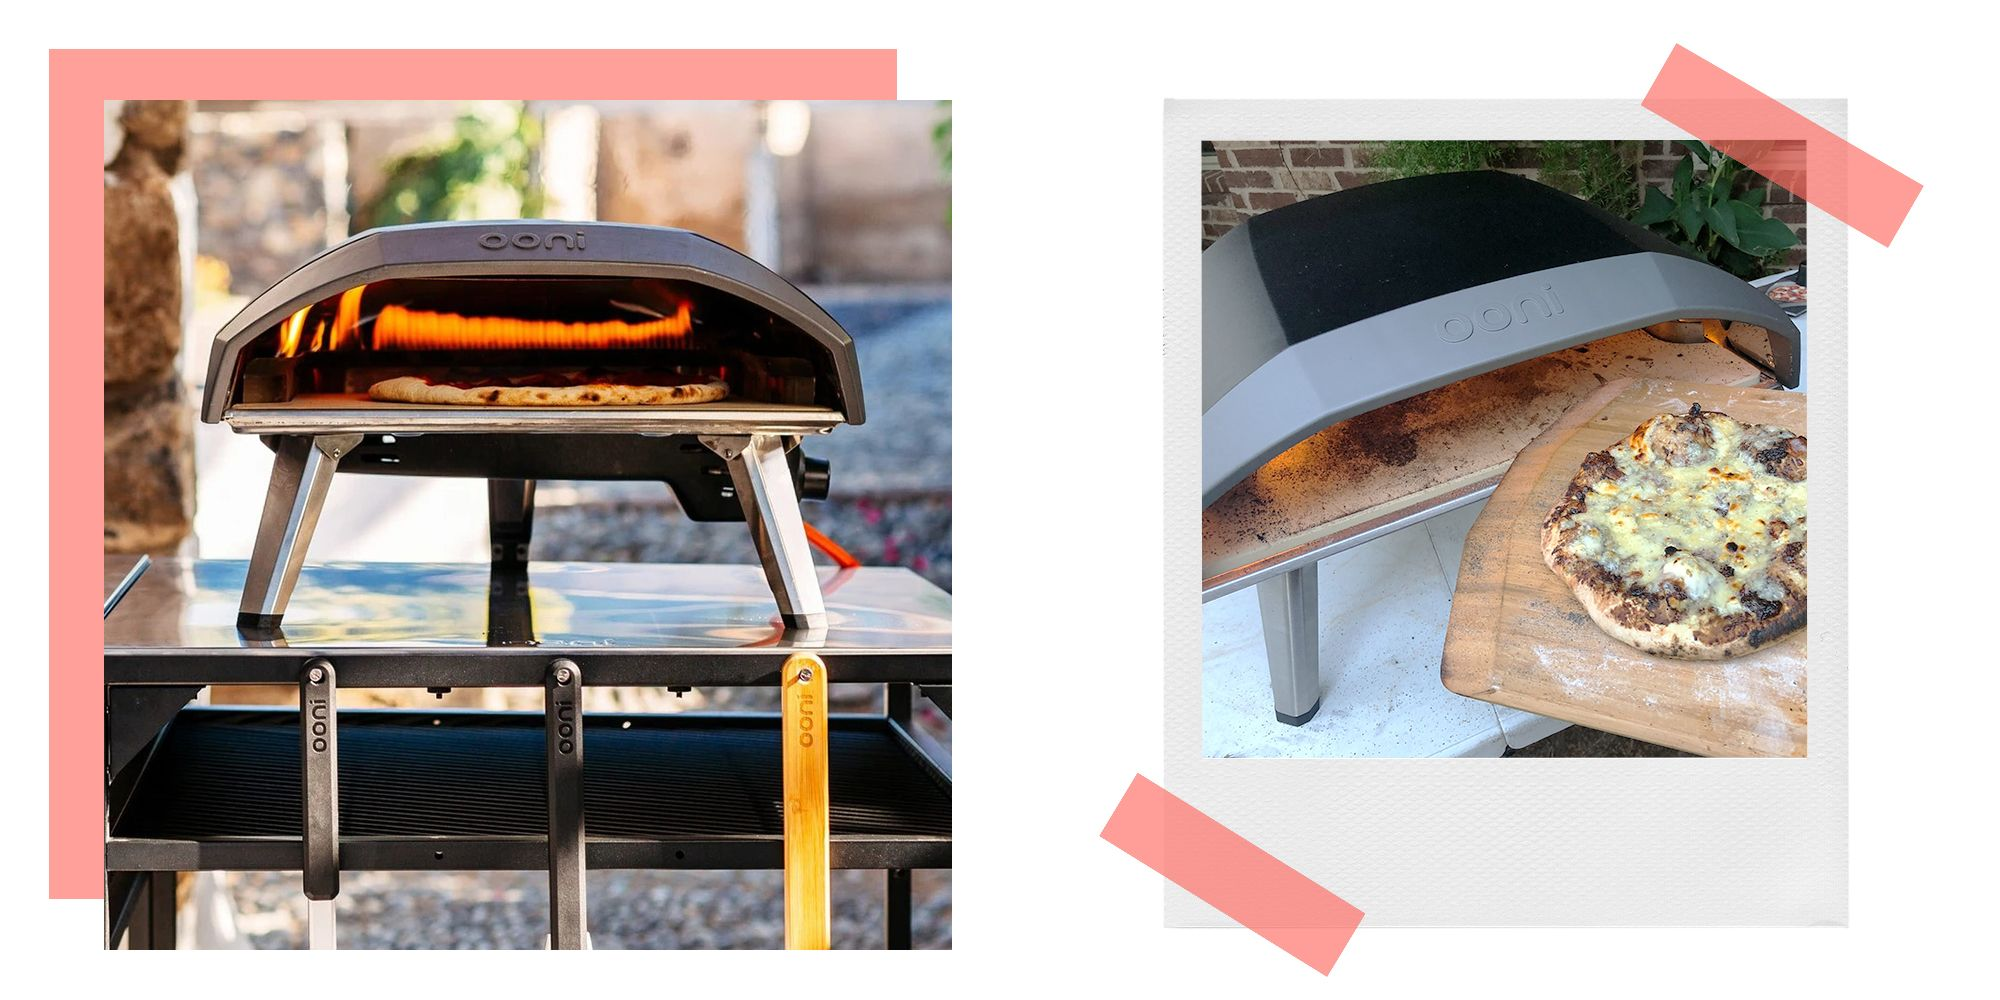 Ooni Koda Pizza Oven Evaluation